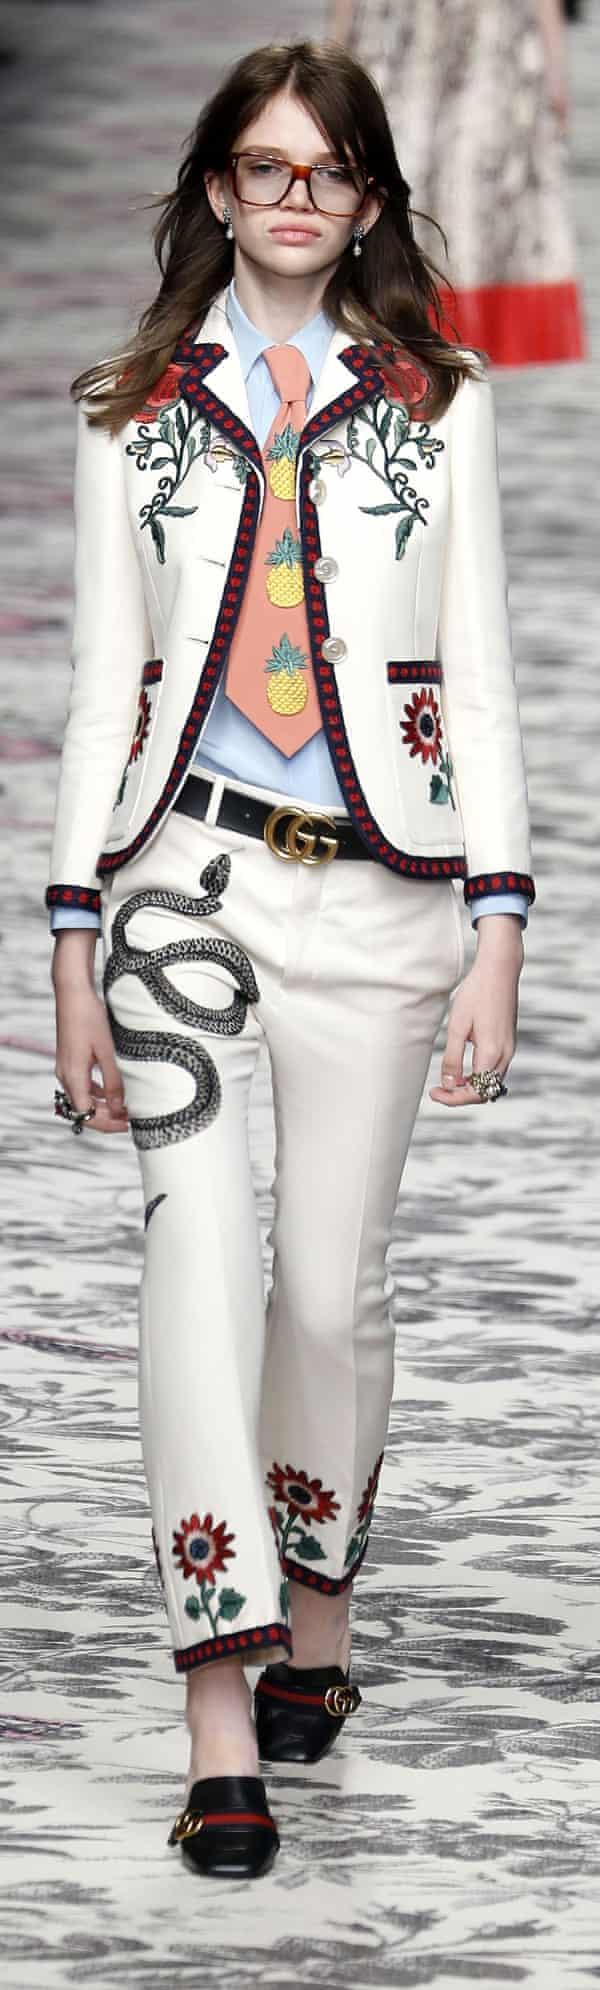 Gucci at Milan Fashion Week on Wednesday.